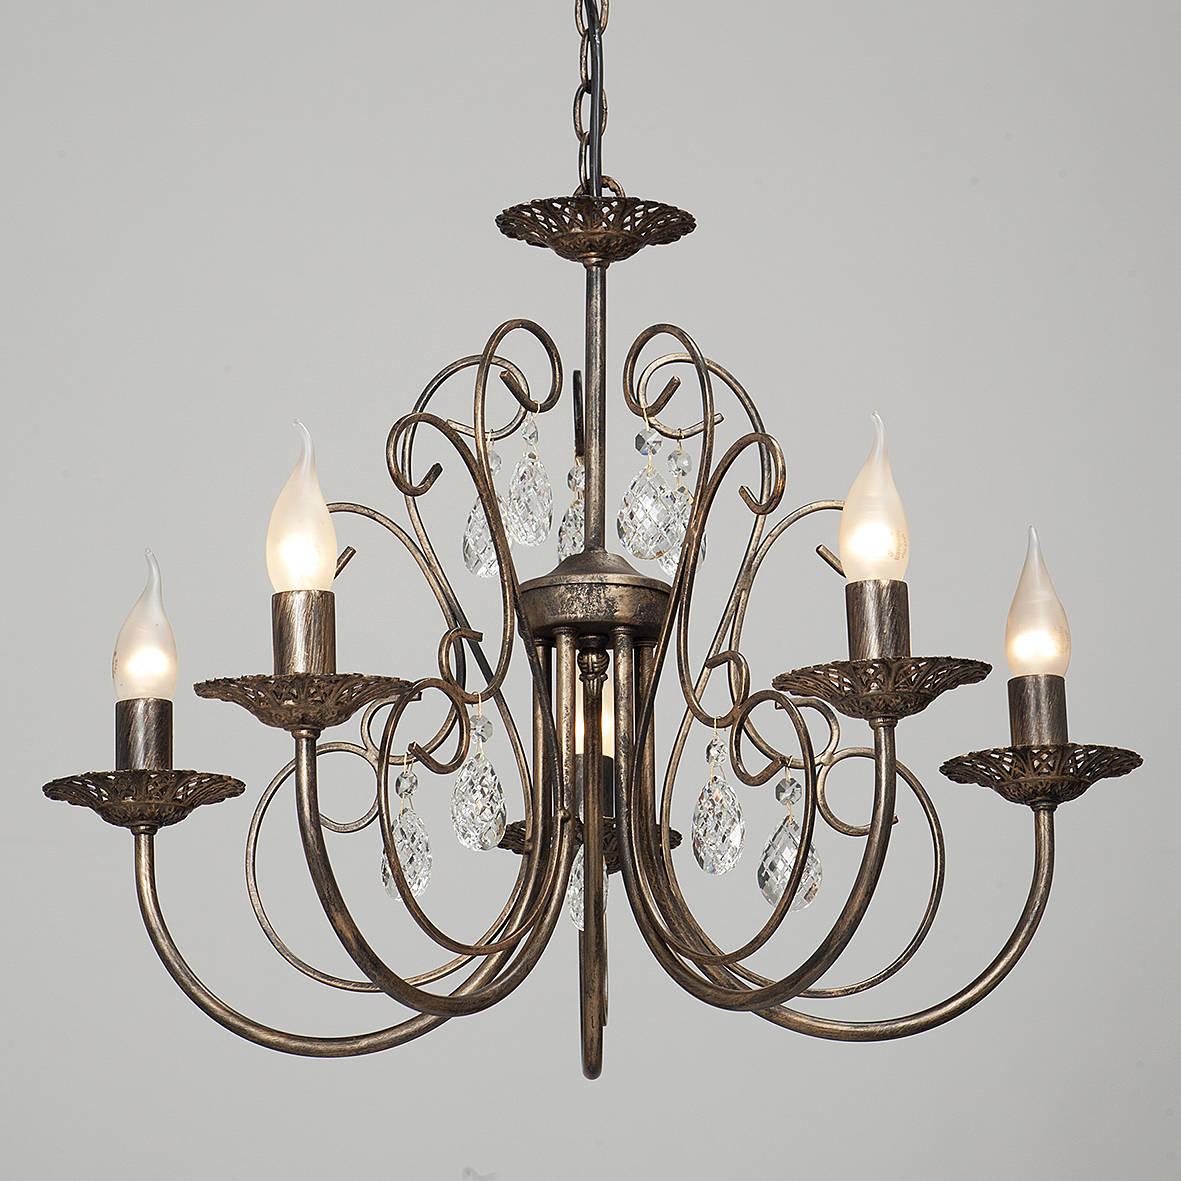 Люстра Vitaluce V1652/5 lucesolara люстра lucesolara 8001 5s цоколь е14 40w gold cream металл стекло 5 ламп